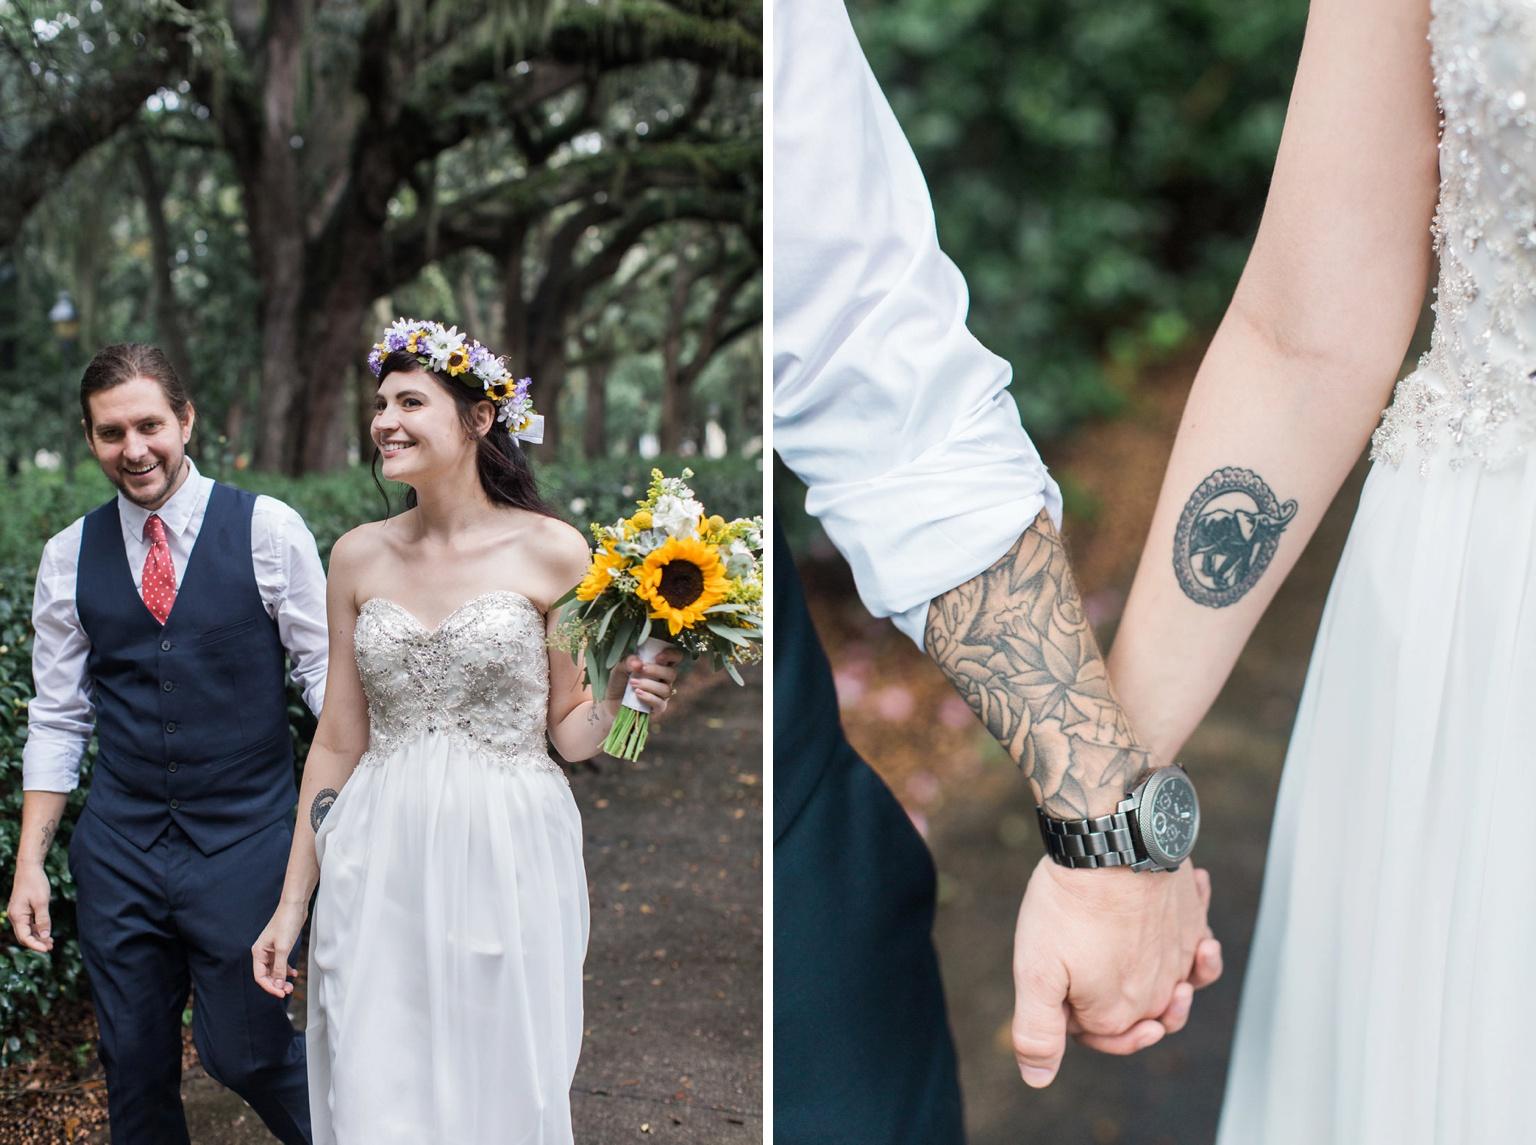 Apt_B_Photo_Savannah_Wedding_Photographer_Flower_Crown056.JPG